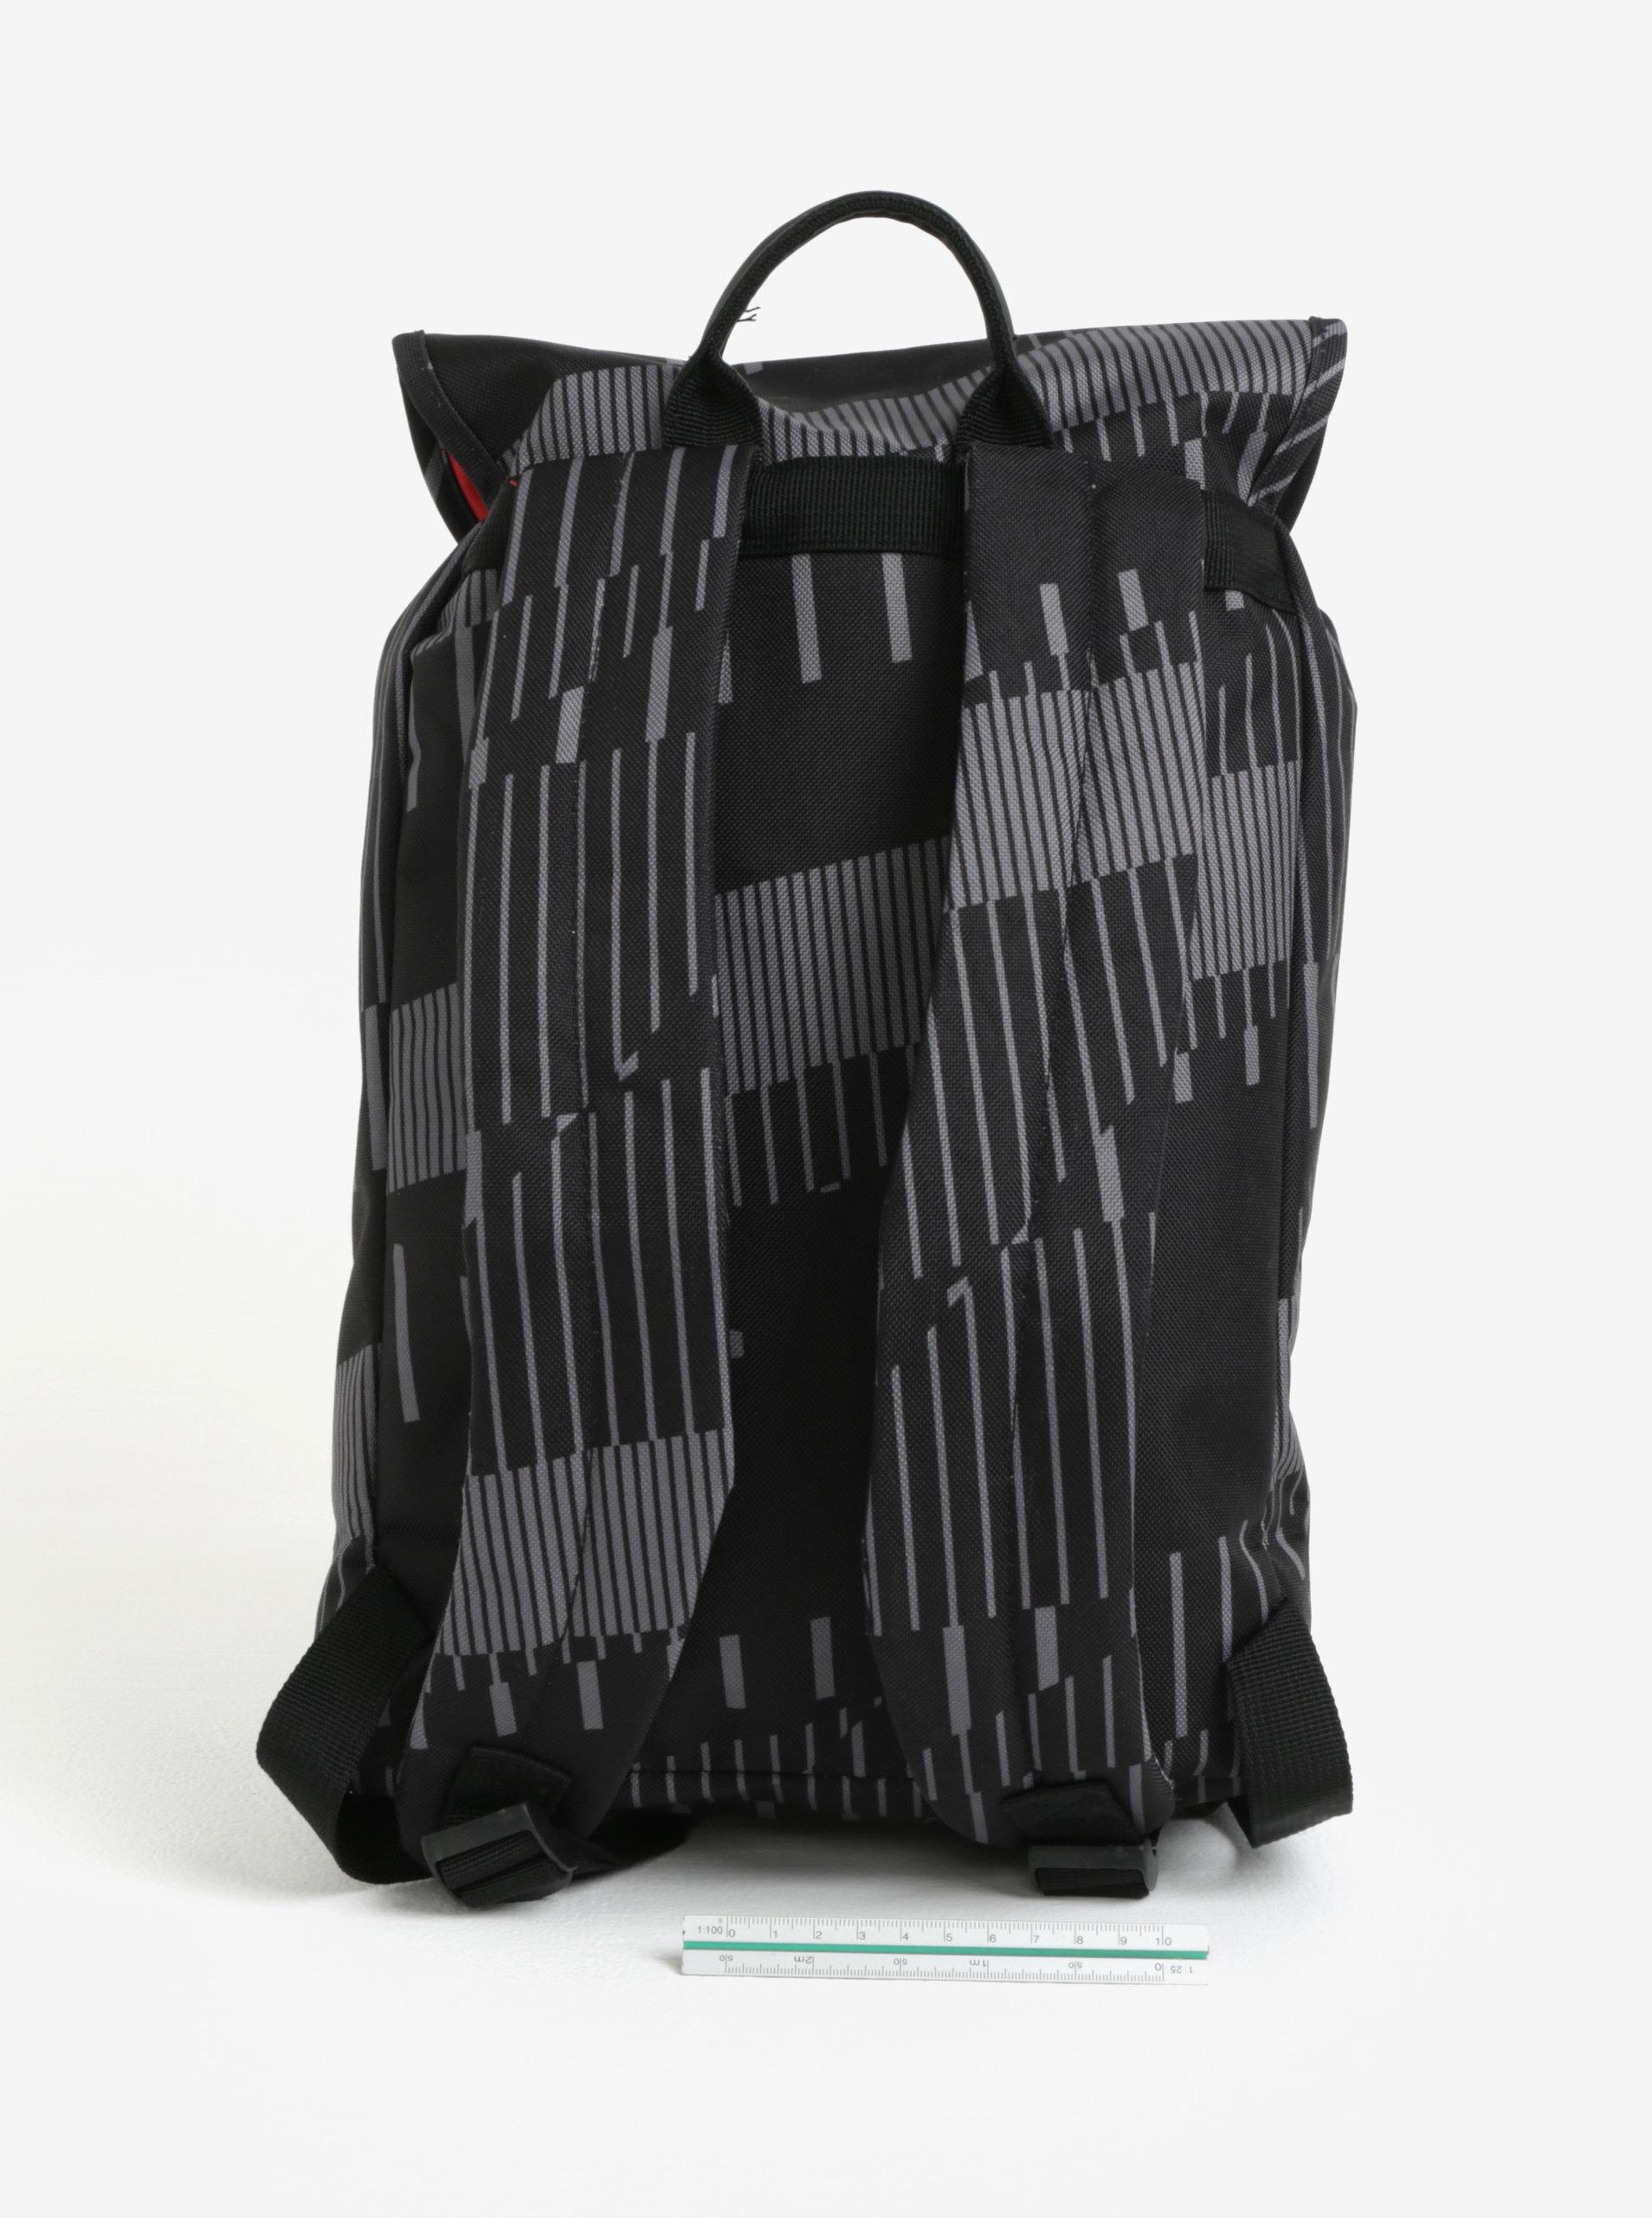 4b3cab9e9b8 Šedo-černý batoh s potiskem The Pack Society 10 l ...